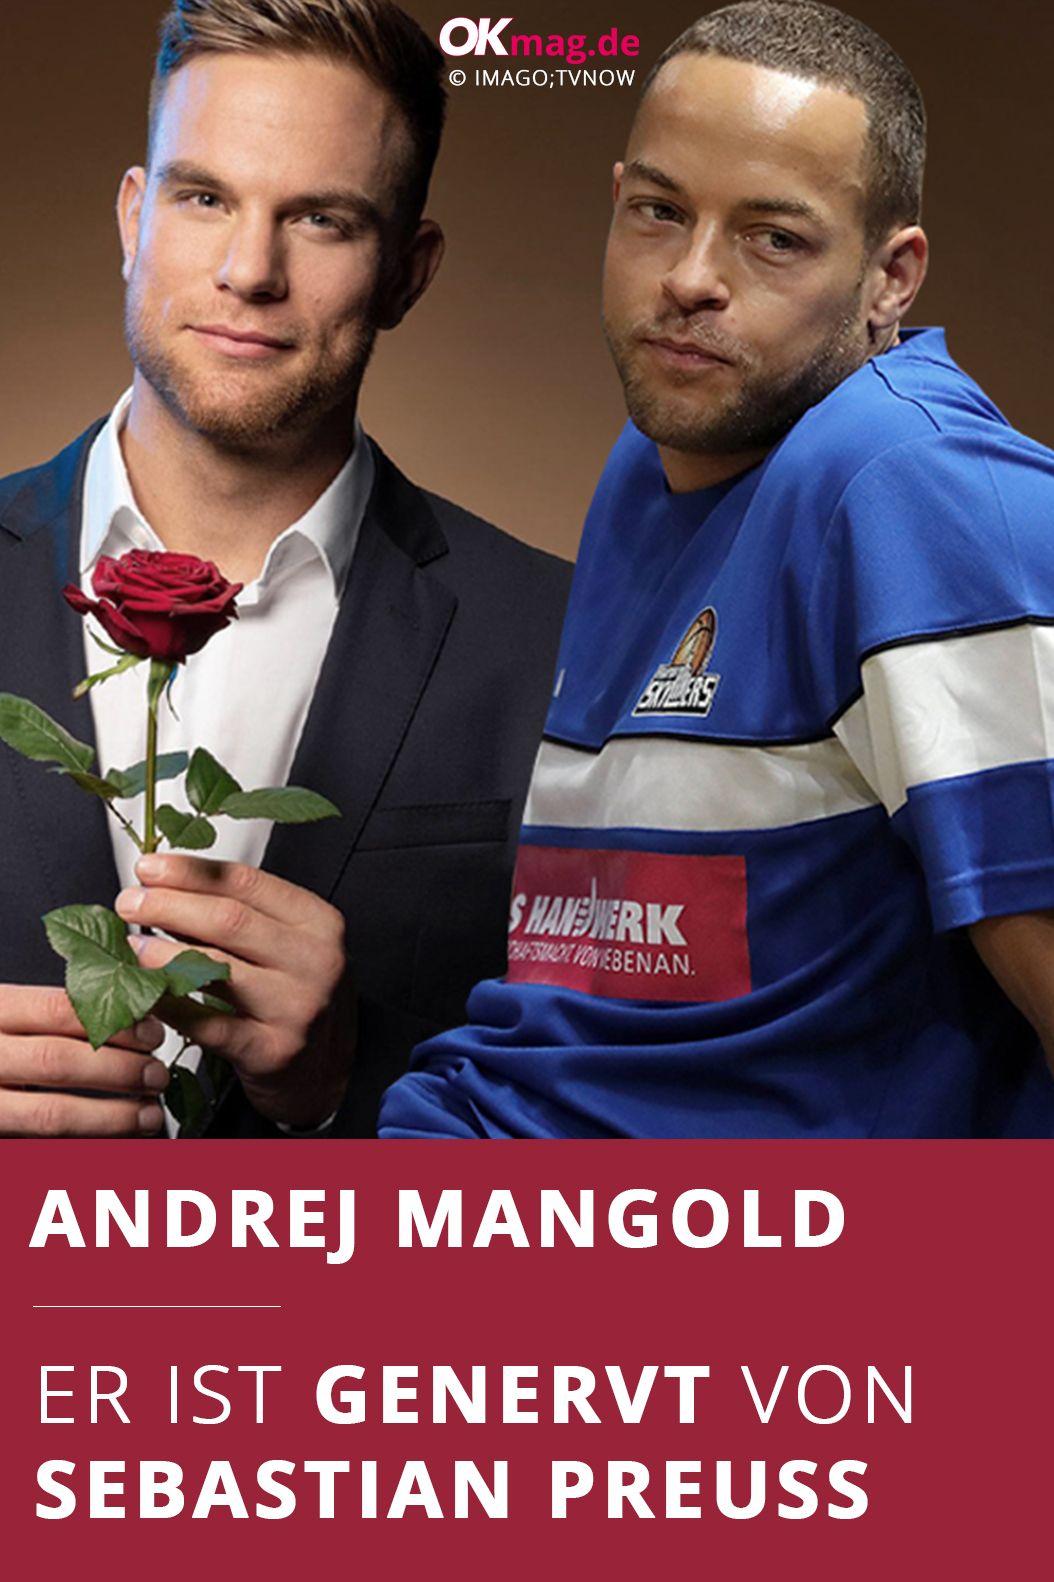 Andrej Mangold Keinen Bock Mehr Auf Bachelor Sebastian Preuss Bachelor Mangold Romantische Momente